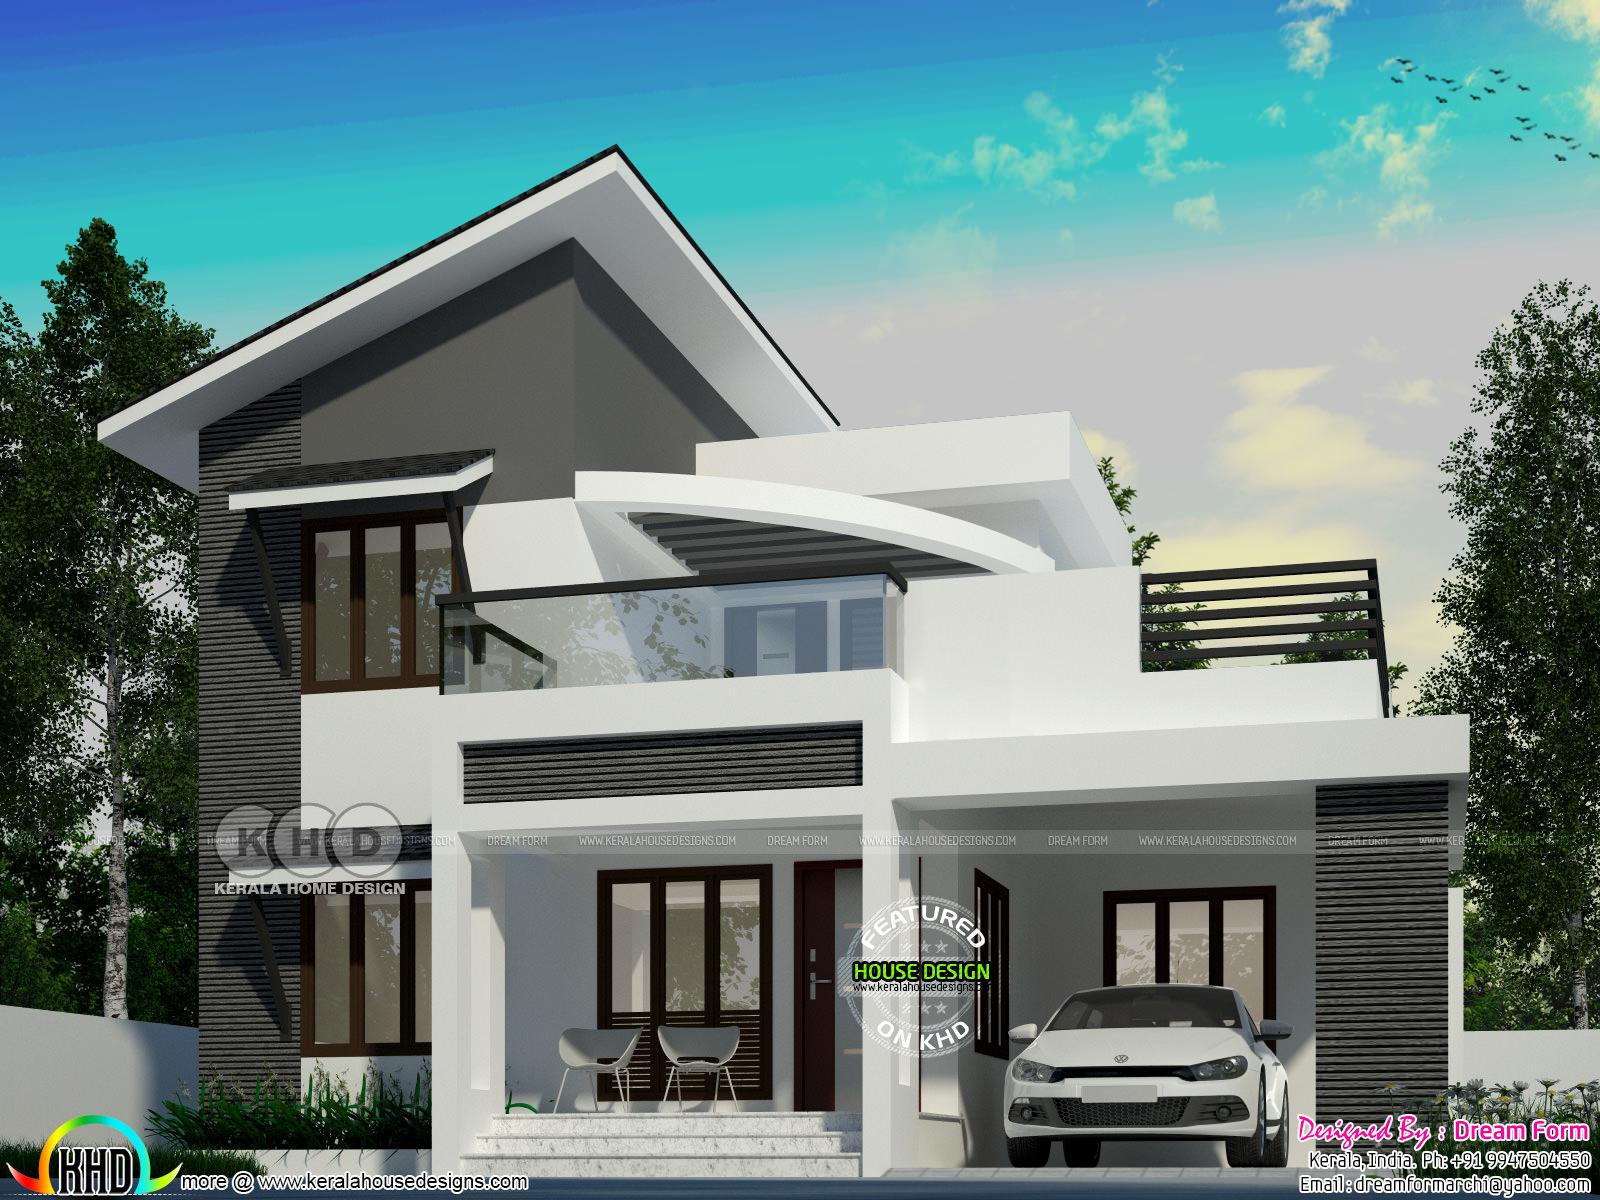 Slanting roof mix modern 4 BHK house design - Kerala home ...